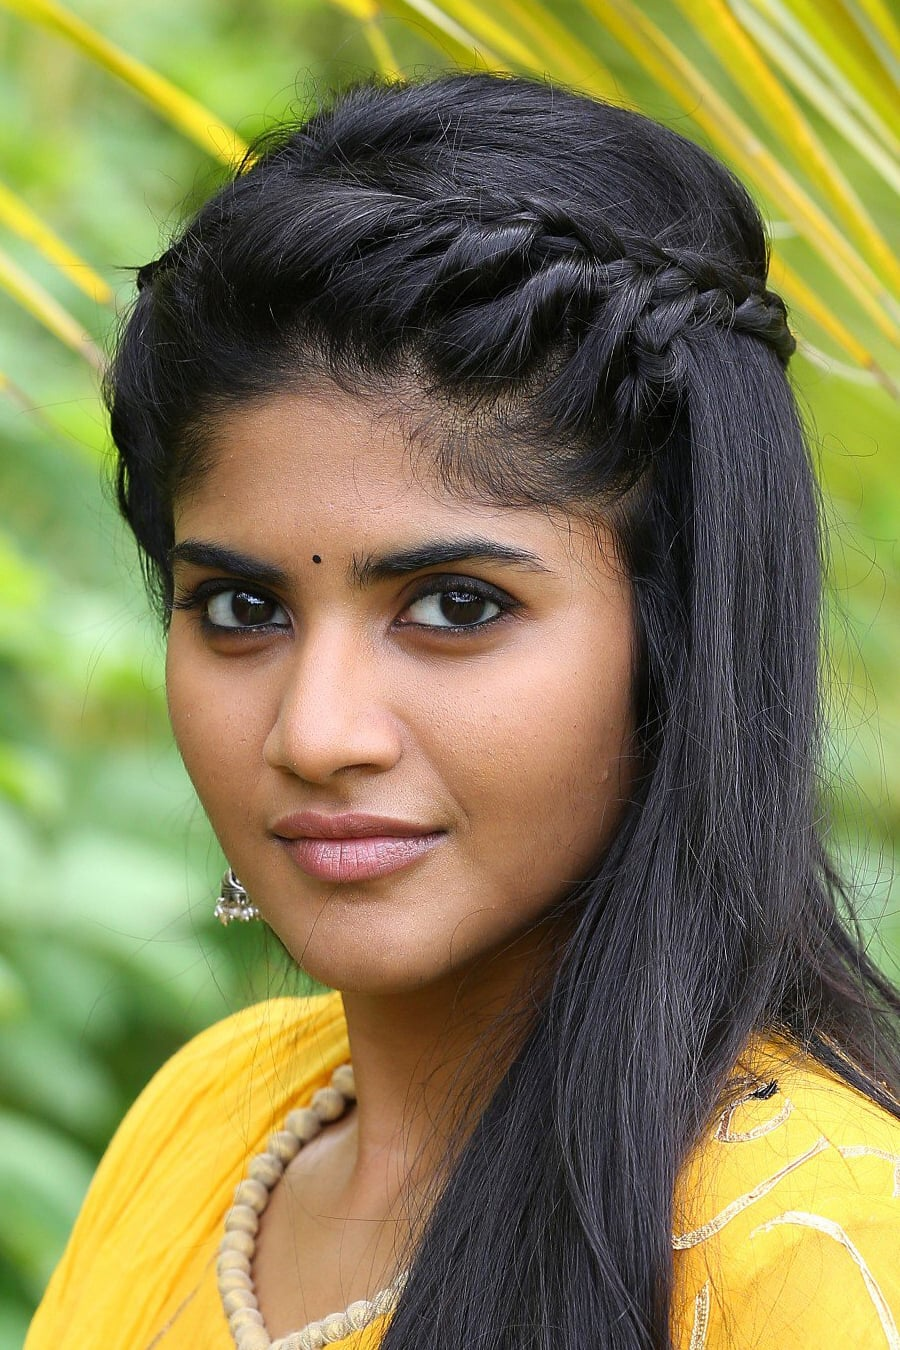 Megha AkashBiography